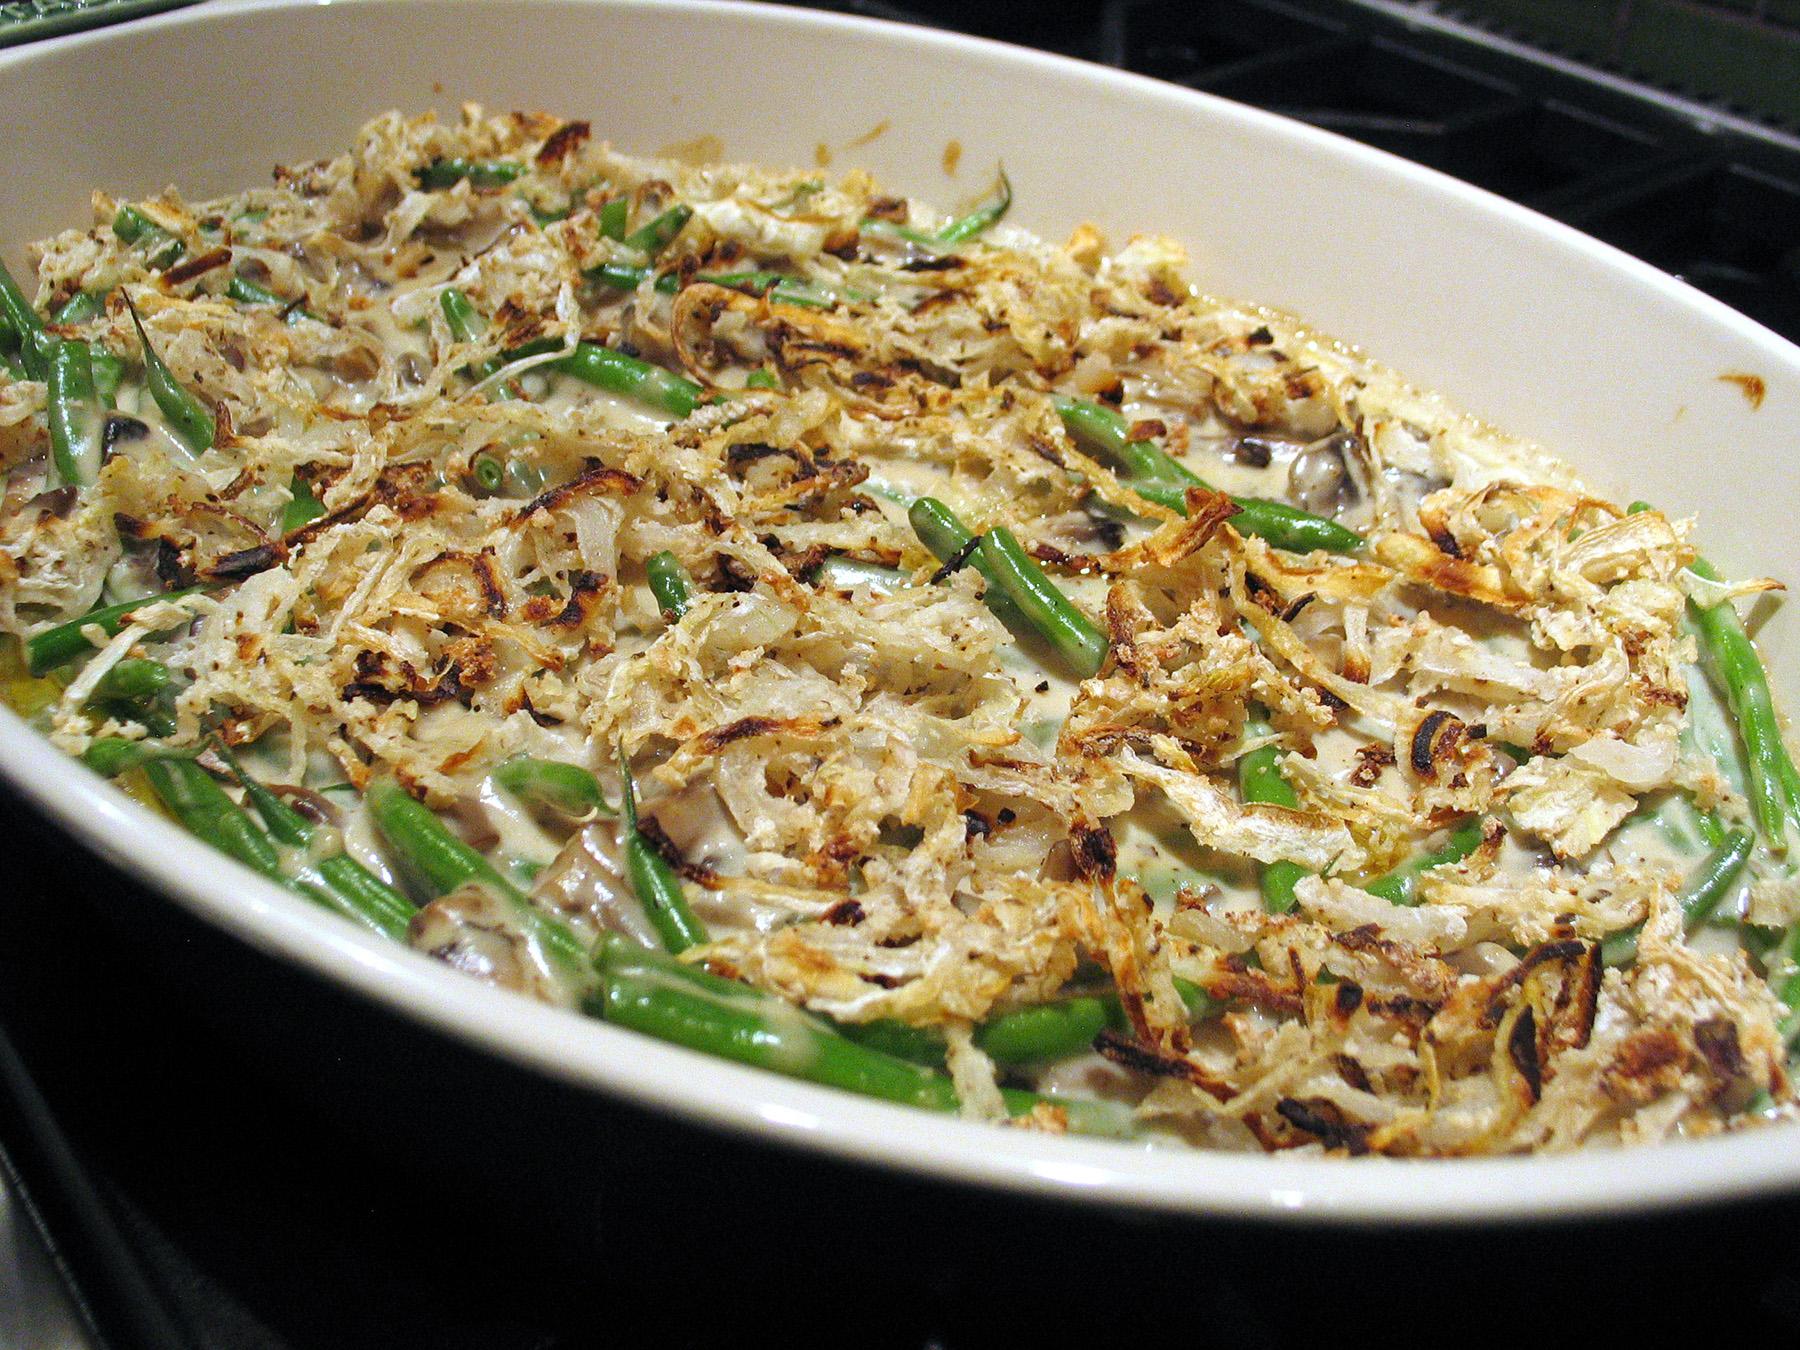 Green Bean Casserole (with Crispy Onions)